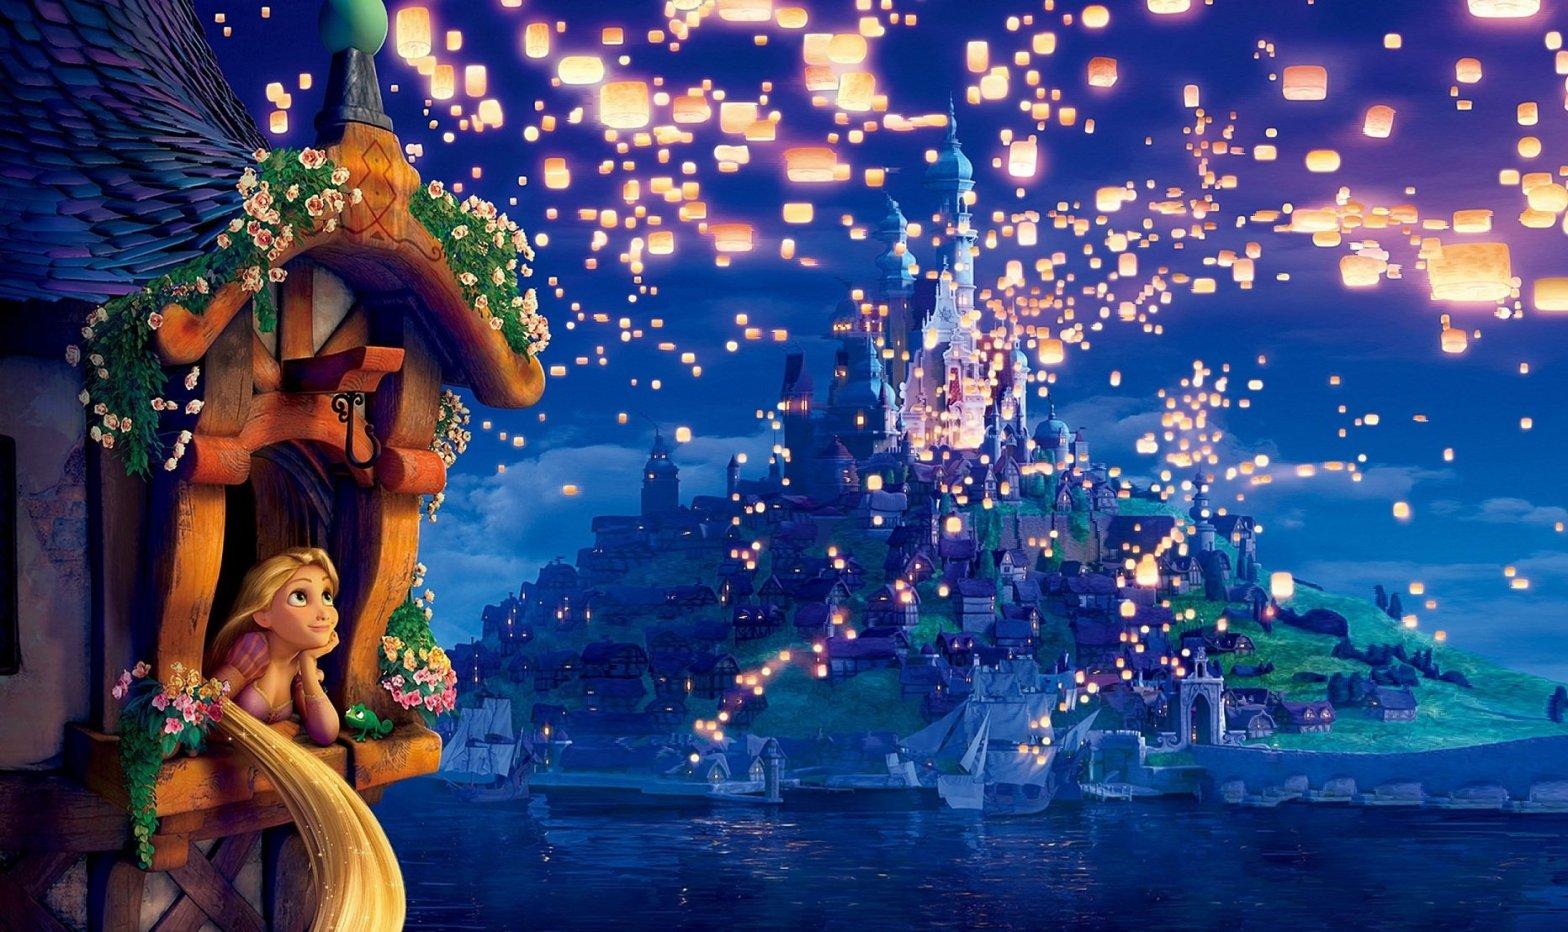 Disney Princess Boot Camp fitness Rapunzel Week movies music nerd blog post